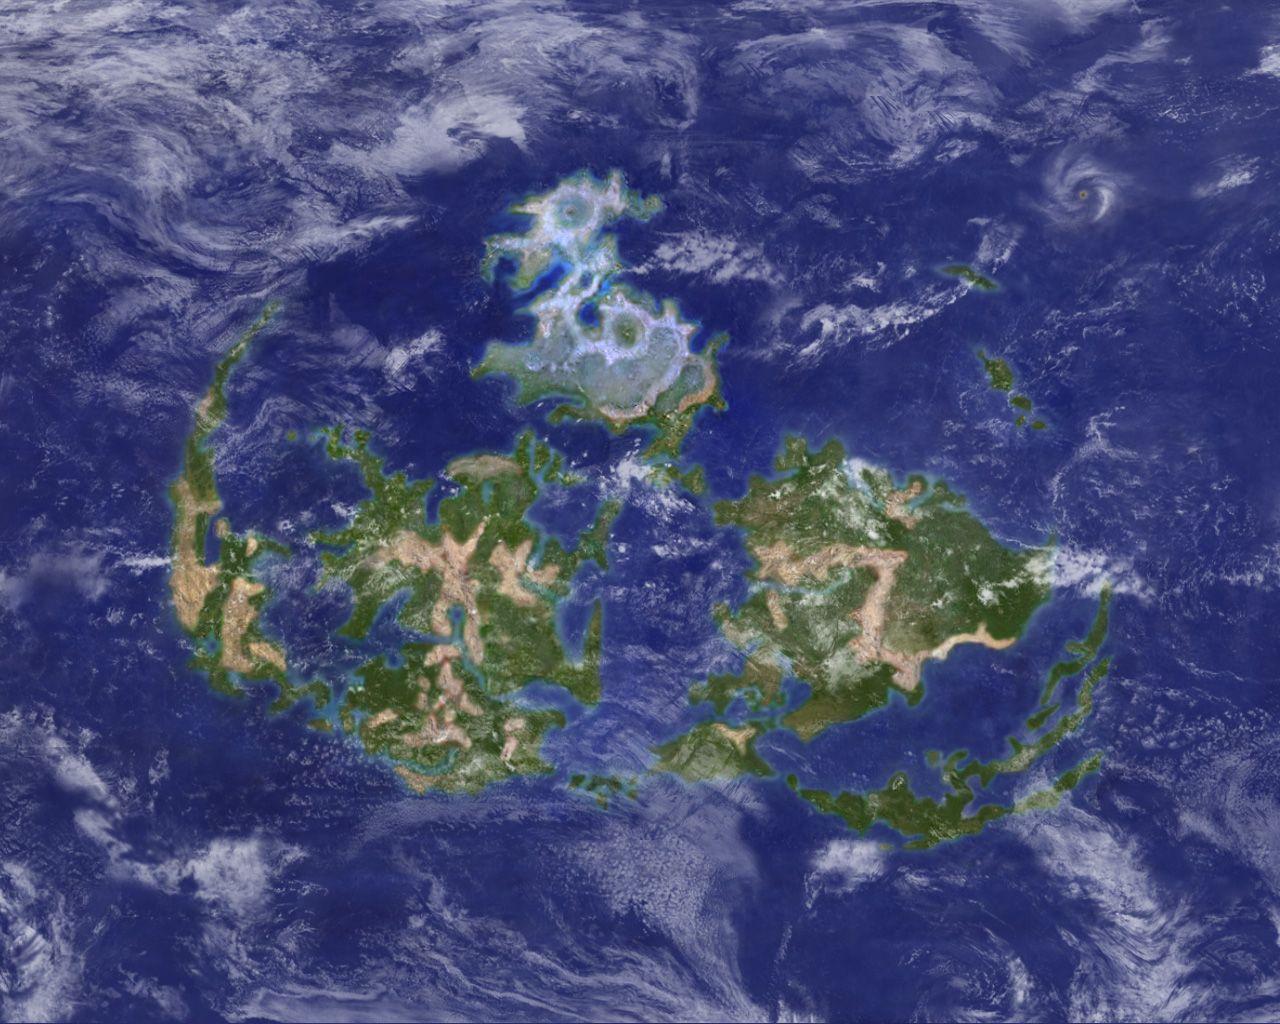 Ff7 world map theme